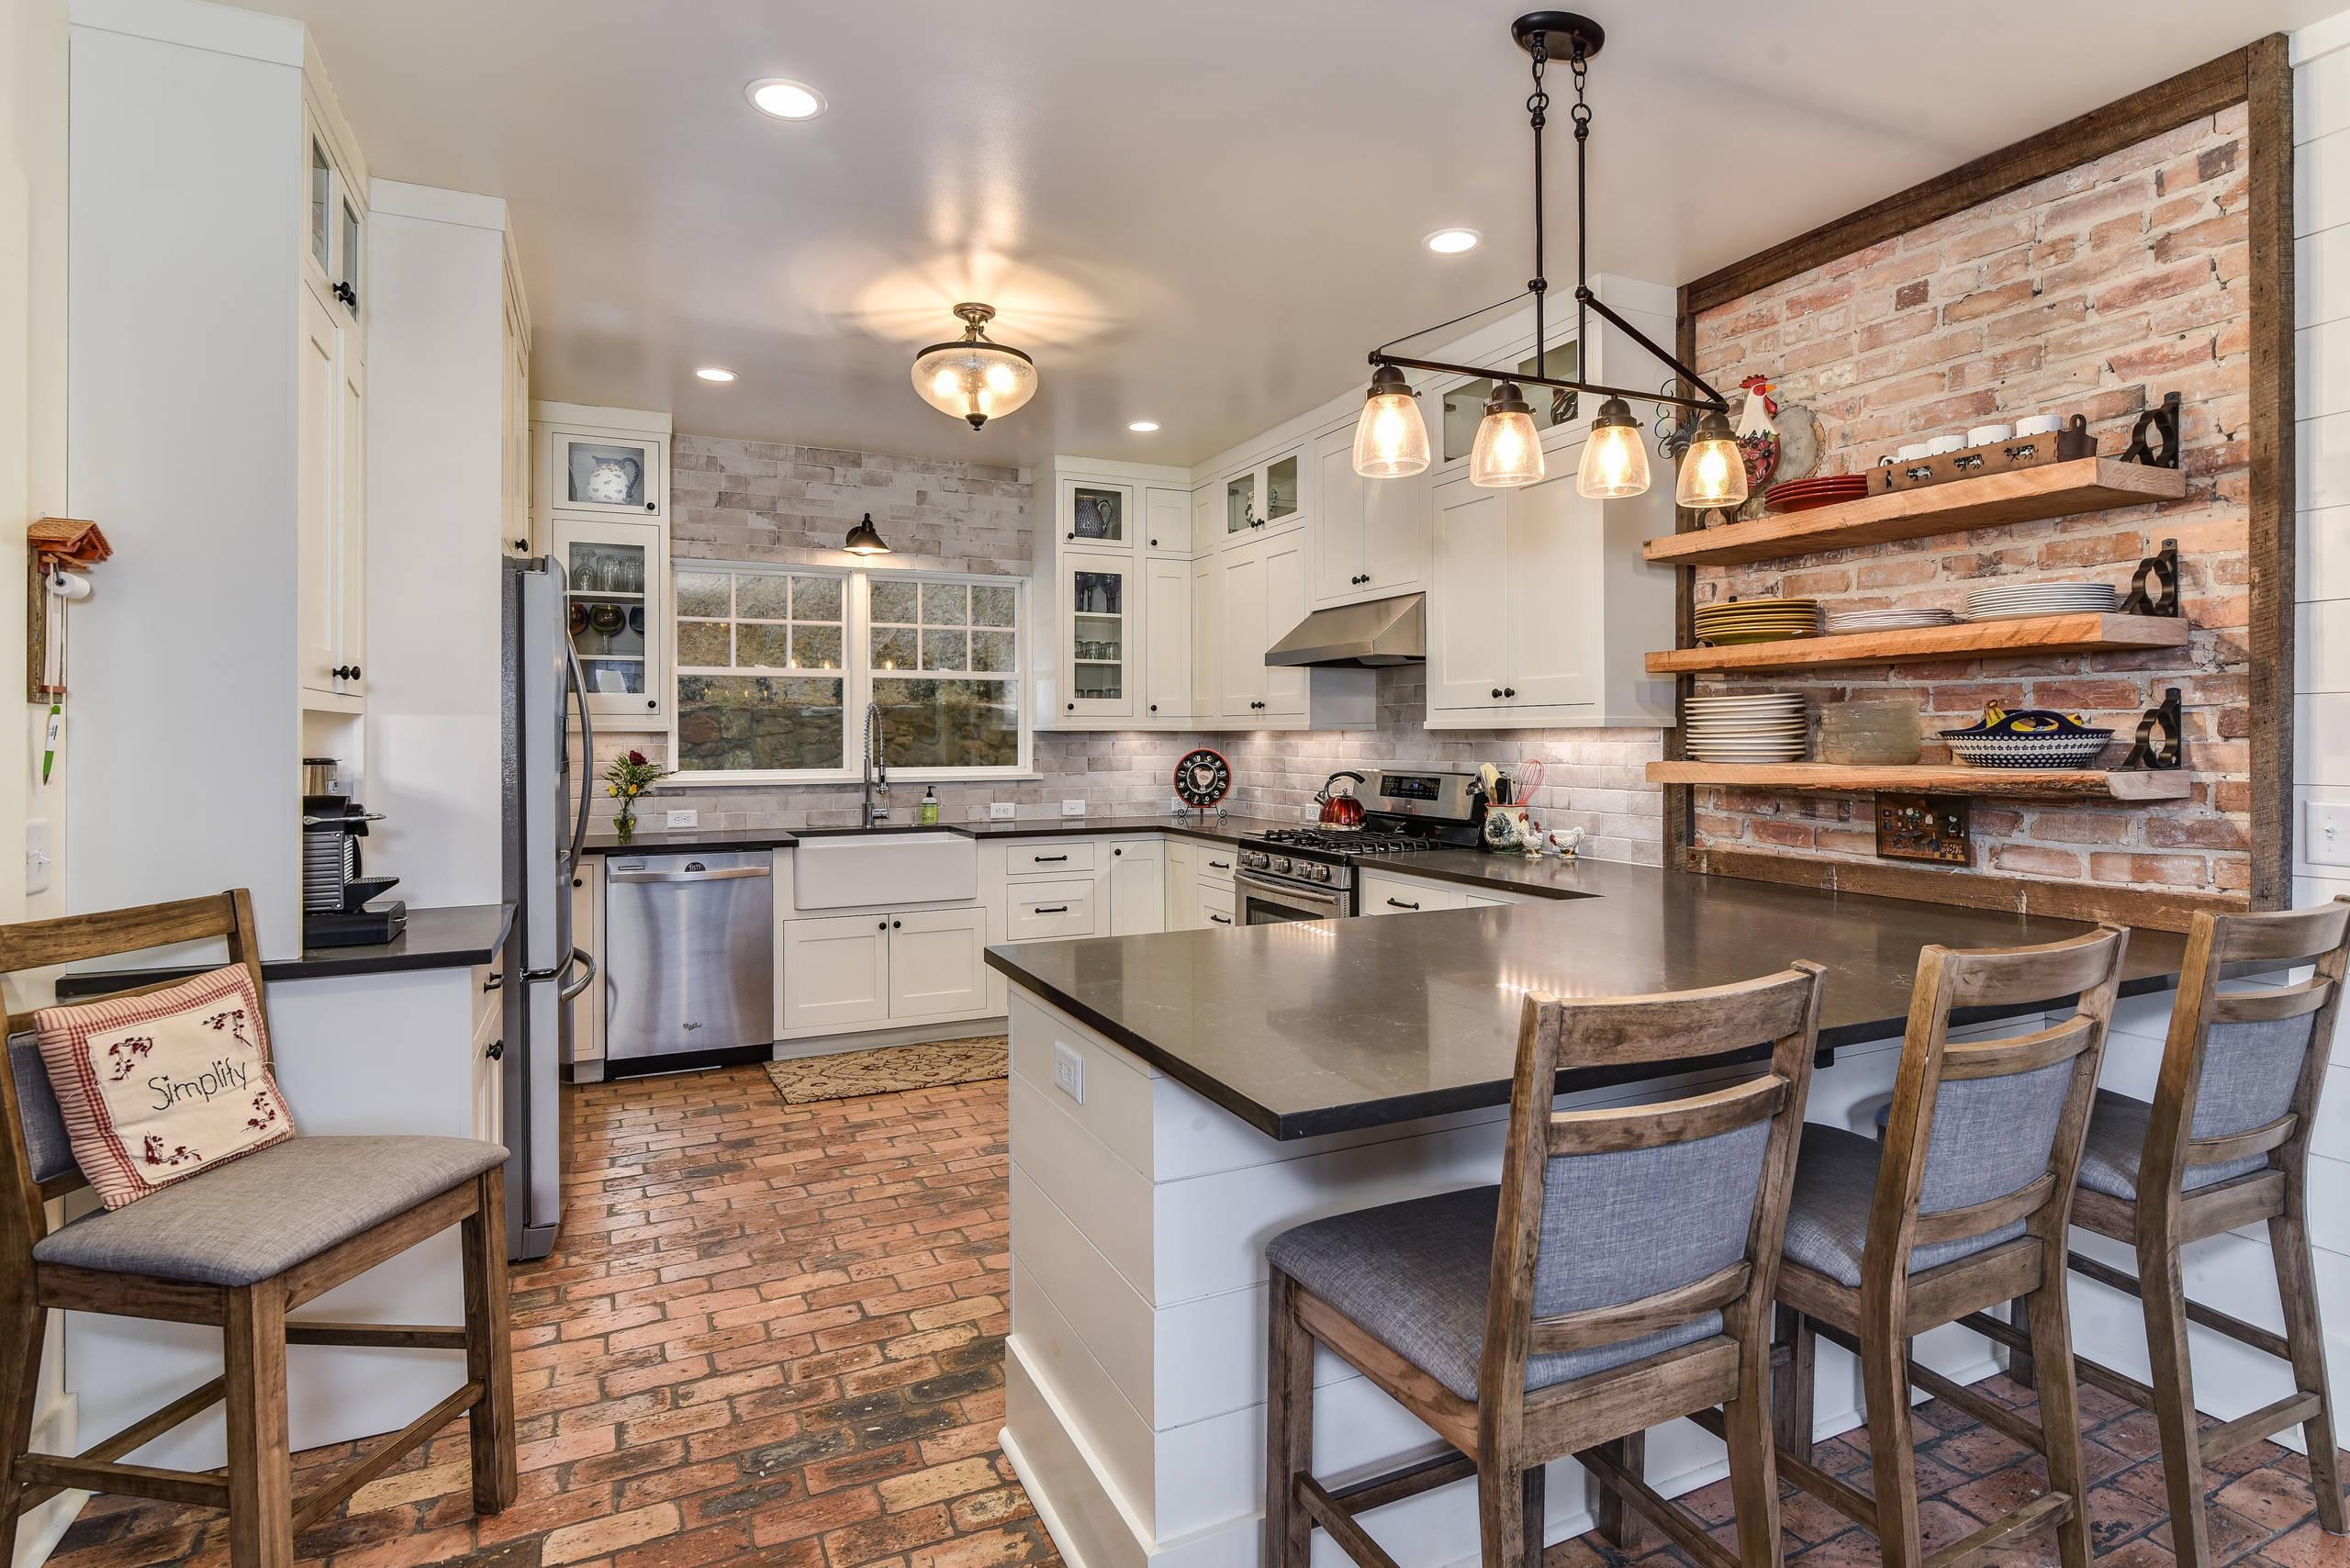 75 Beautiful Brick Floor Kitchen Pictures Ideas July 2021 Houzz